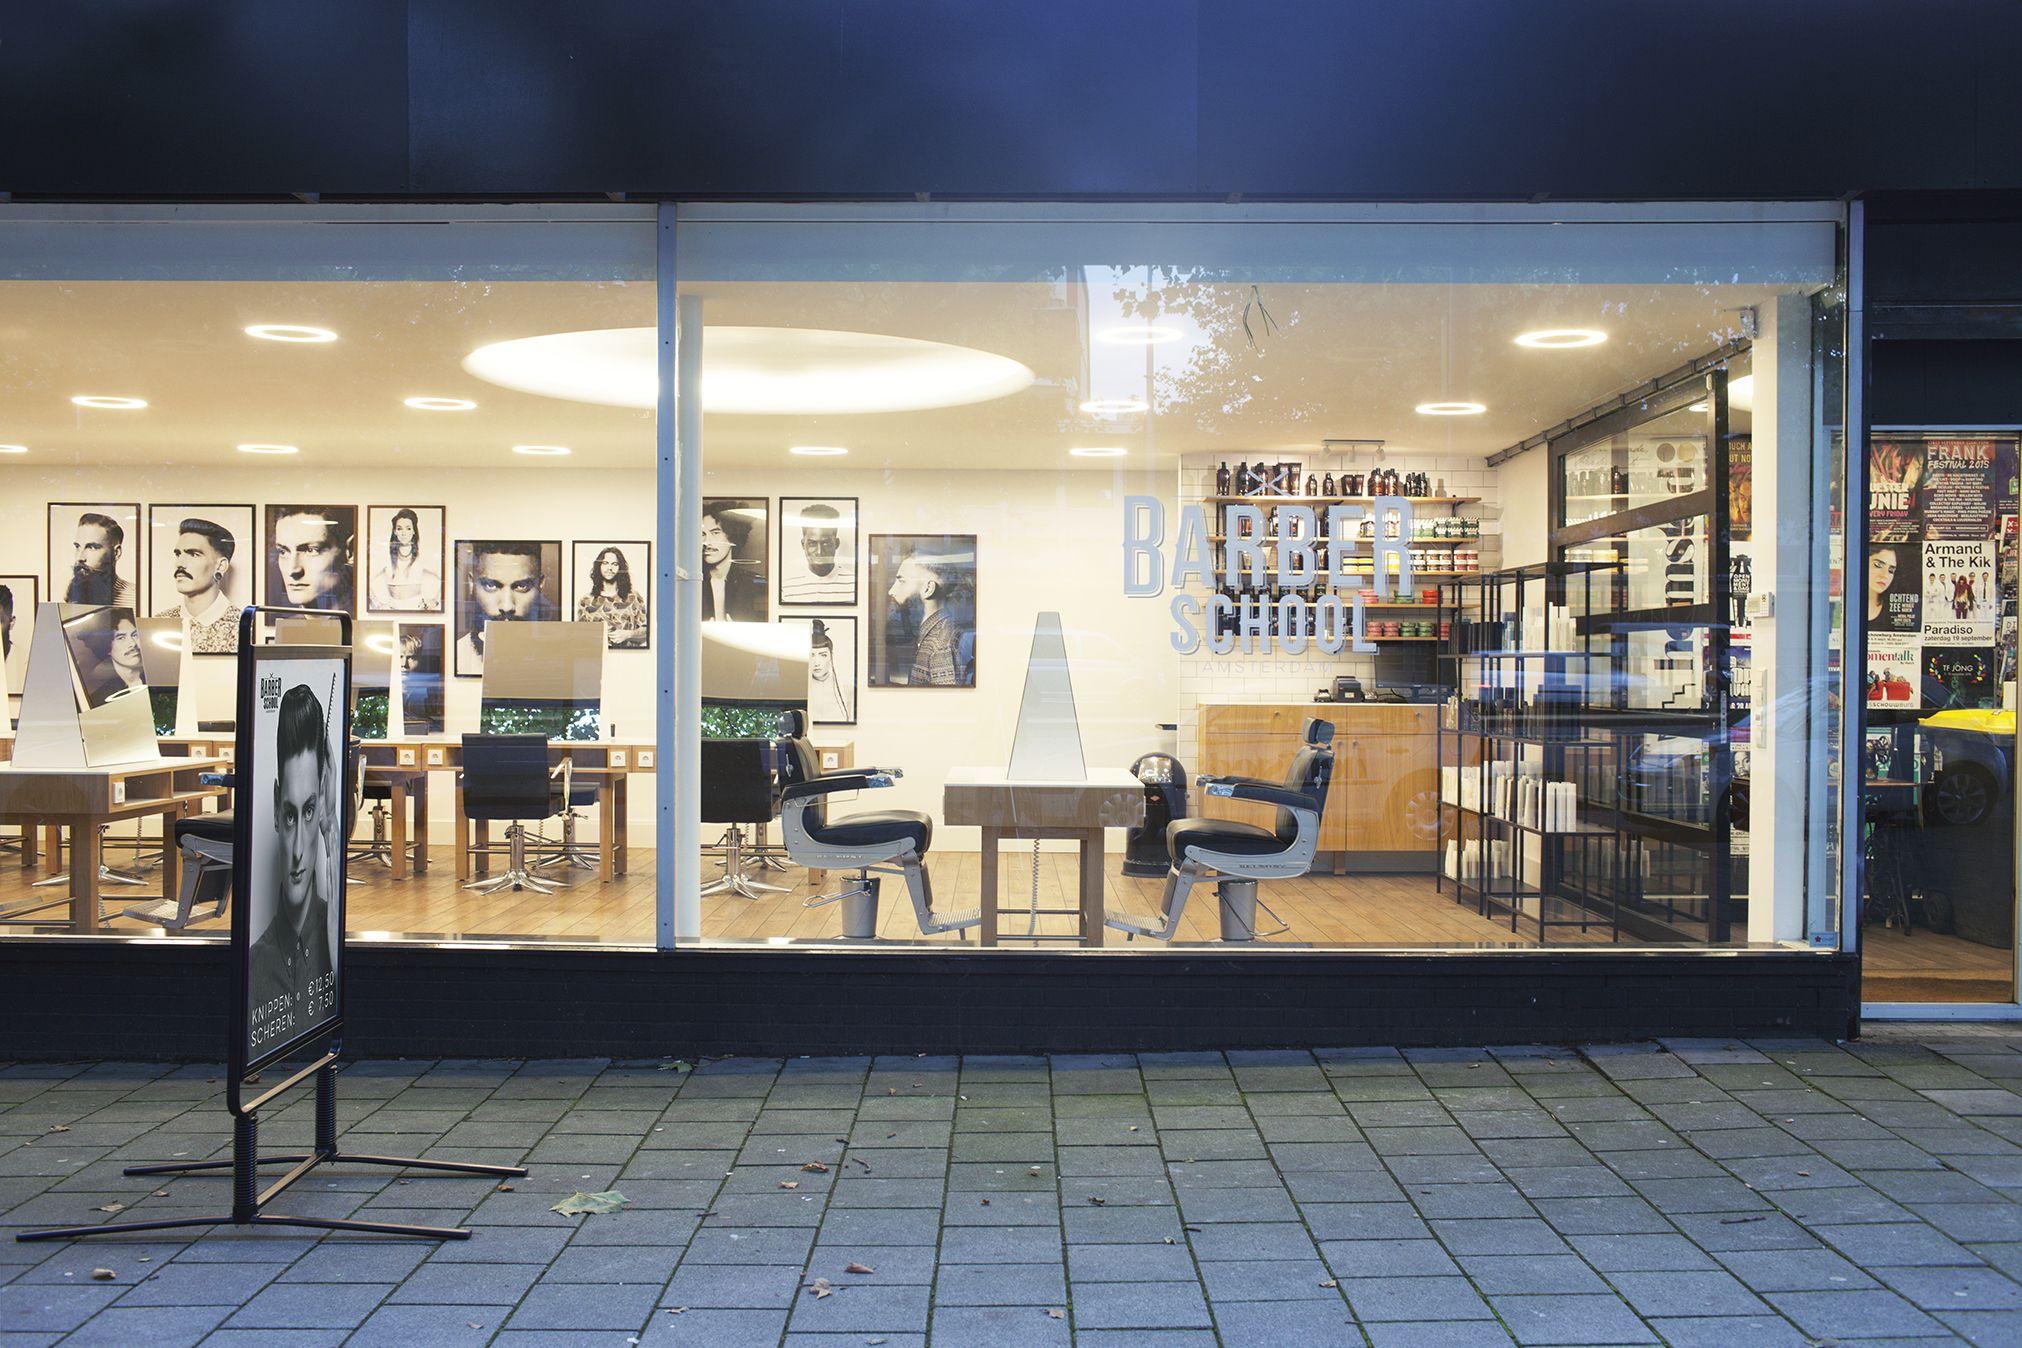 Interior design school amsterdam for Interieur design amsterdam